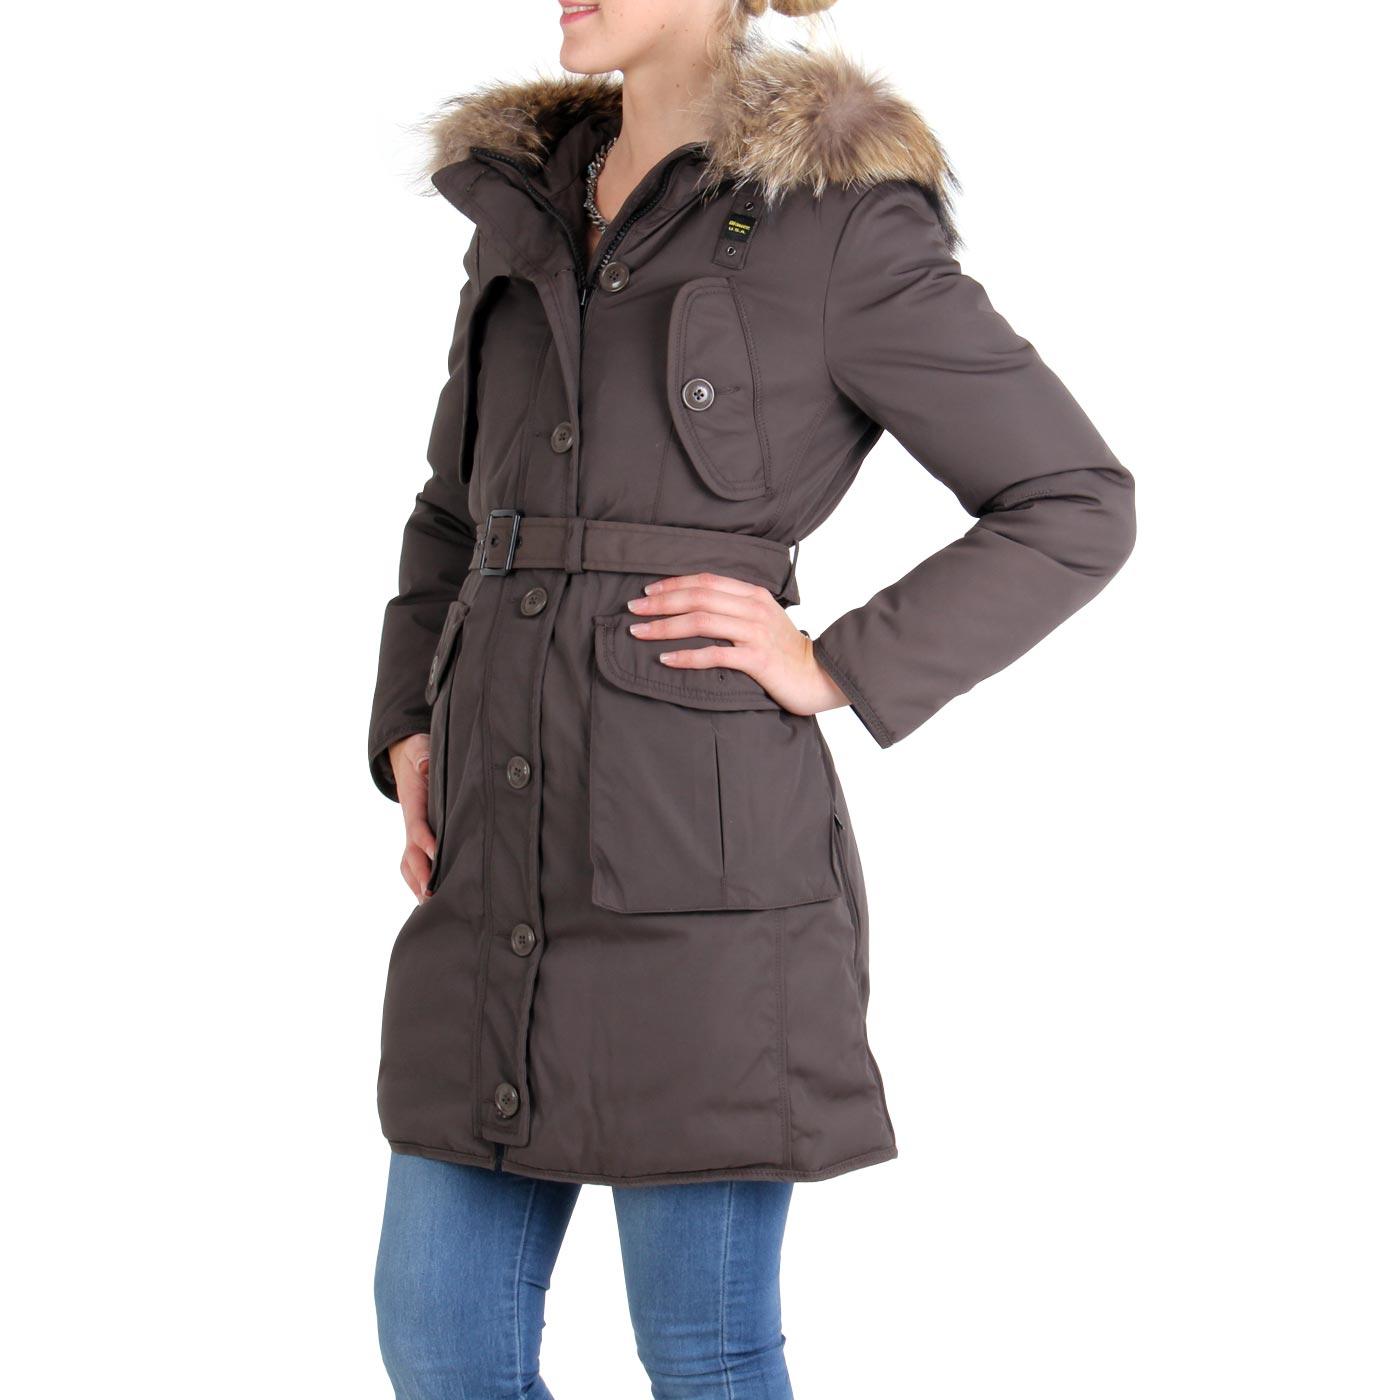 blauer usa damen winter daunen parka mantel jacke brown bld0439 ebay. Black Bedroom Furniture Sets. Home Design Ideas